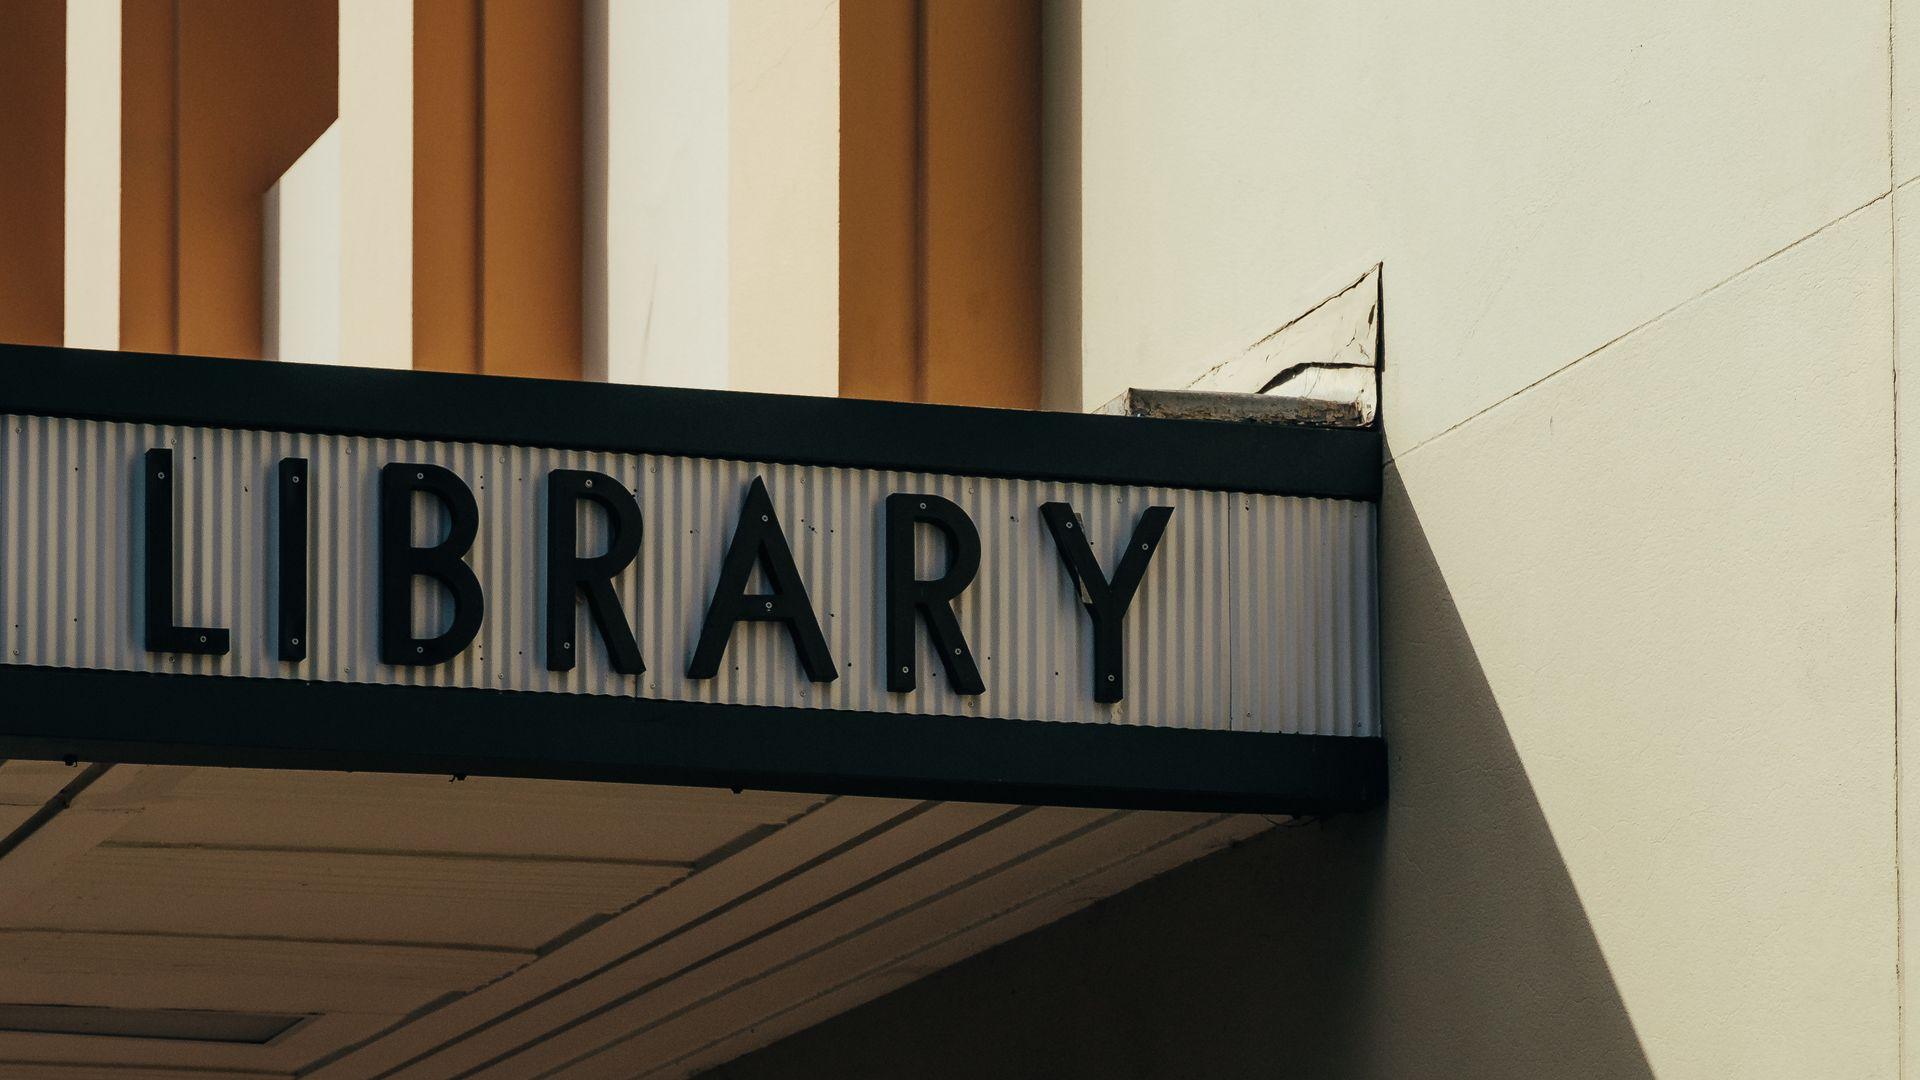 library desktop background